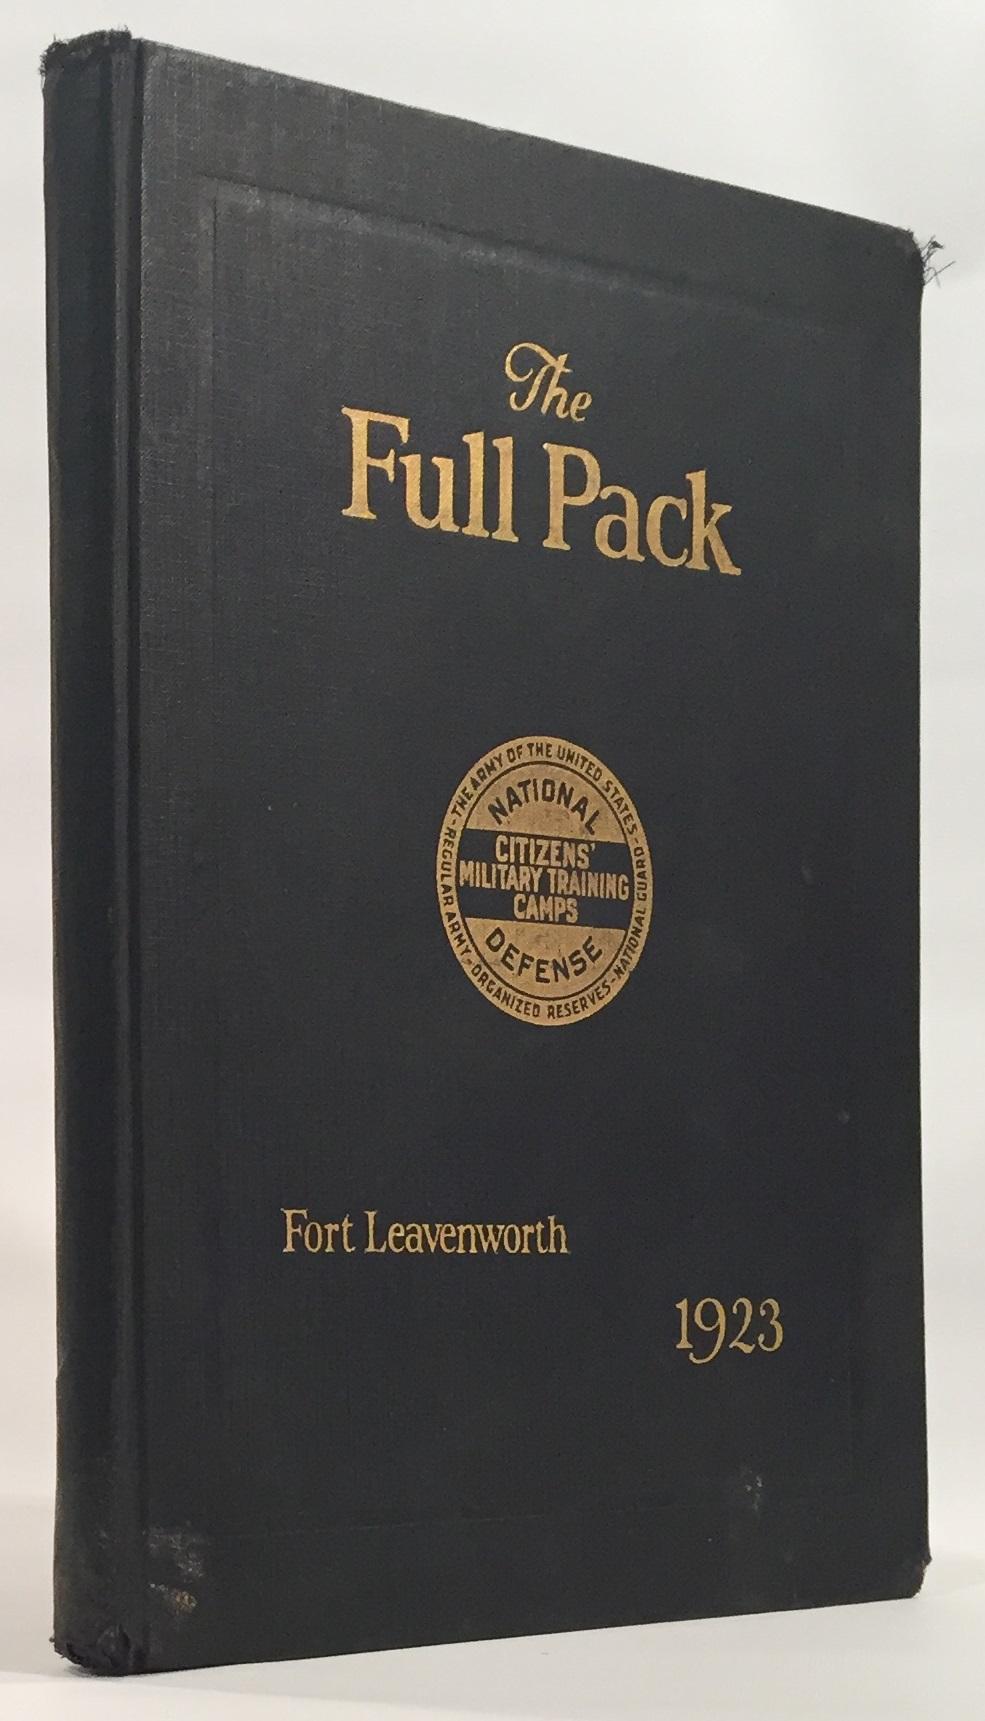 The Full Pack Seventh Corps Area Fort Leavenworth, Kansas`